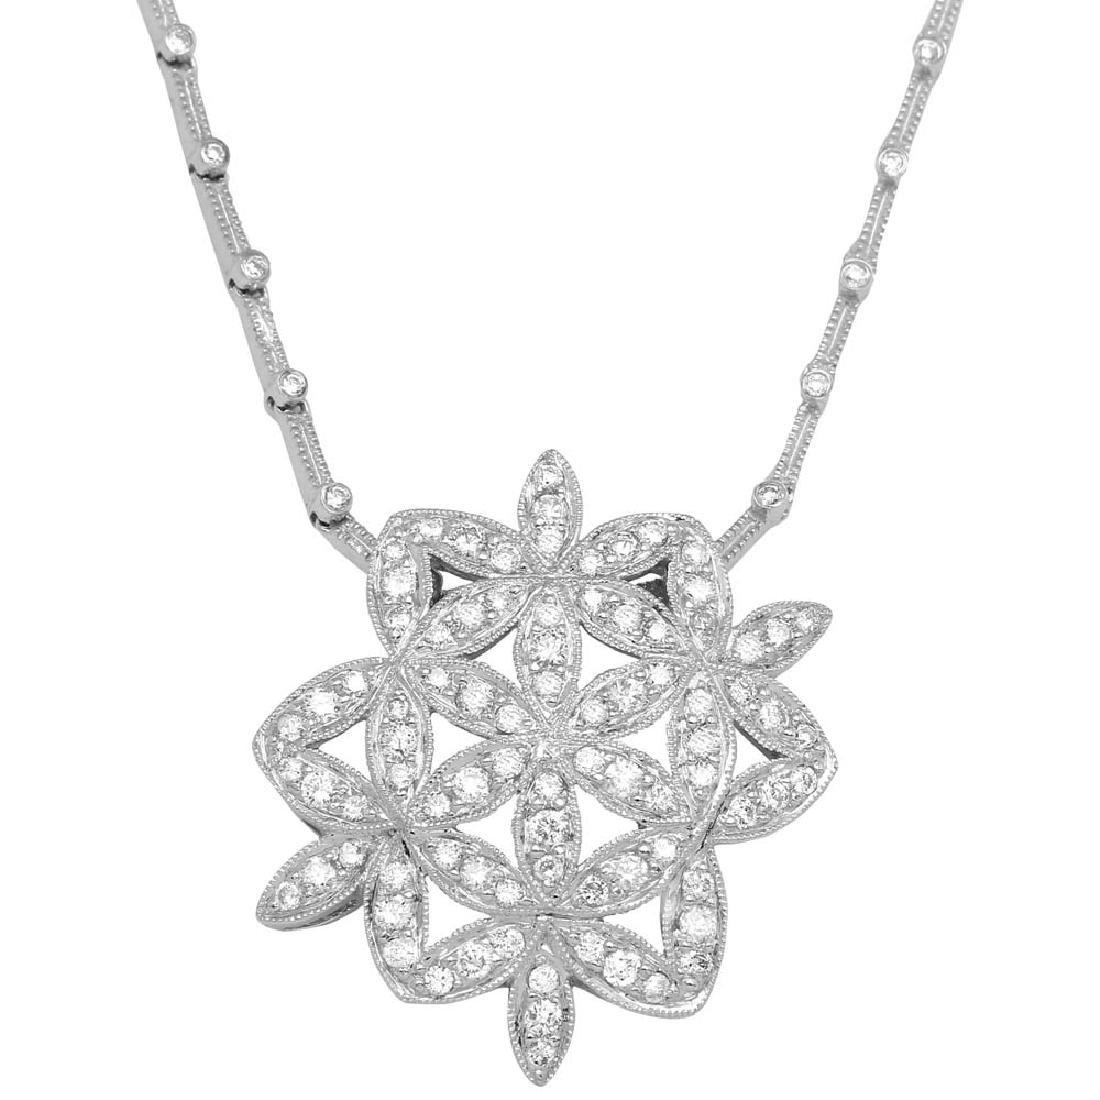 Genuine 1.32 TCW 18K White Gold Ladies Necklace